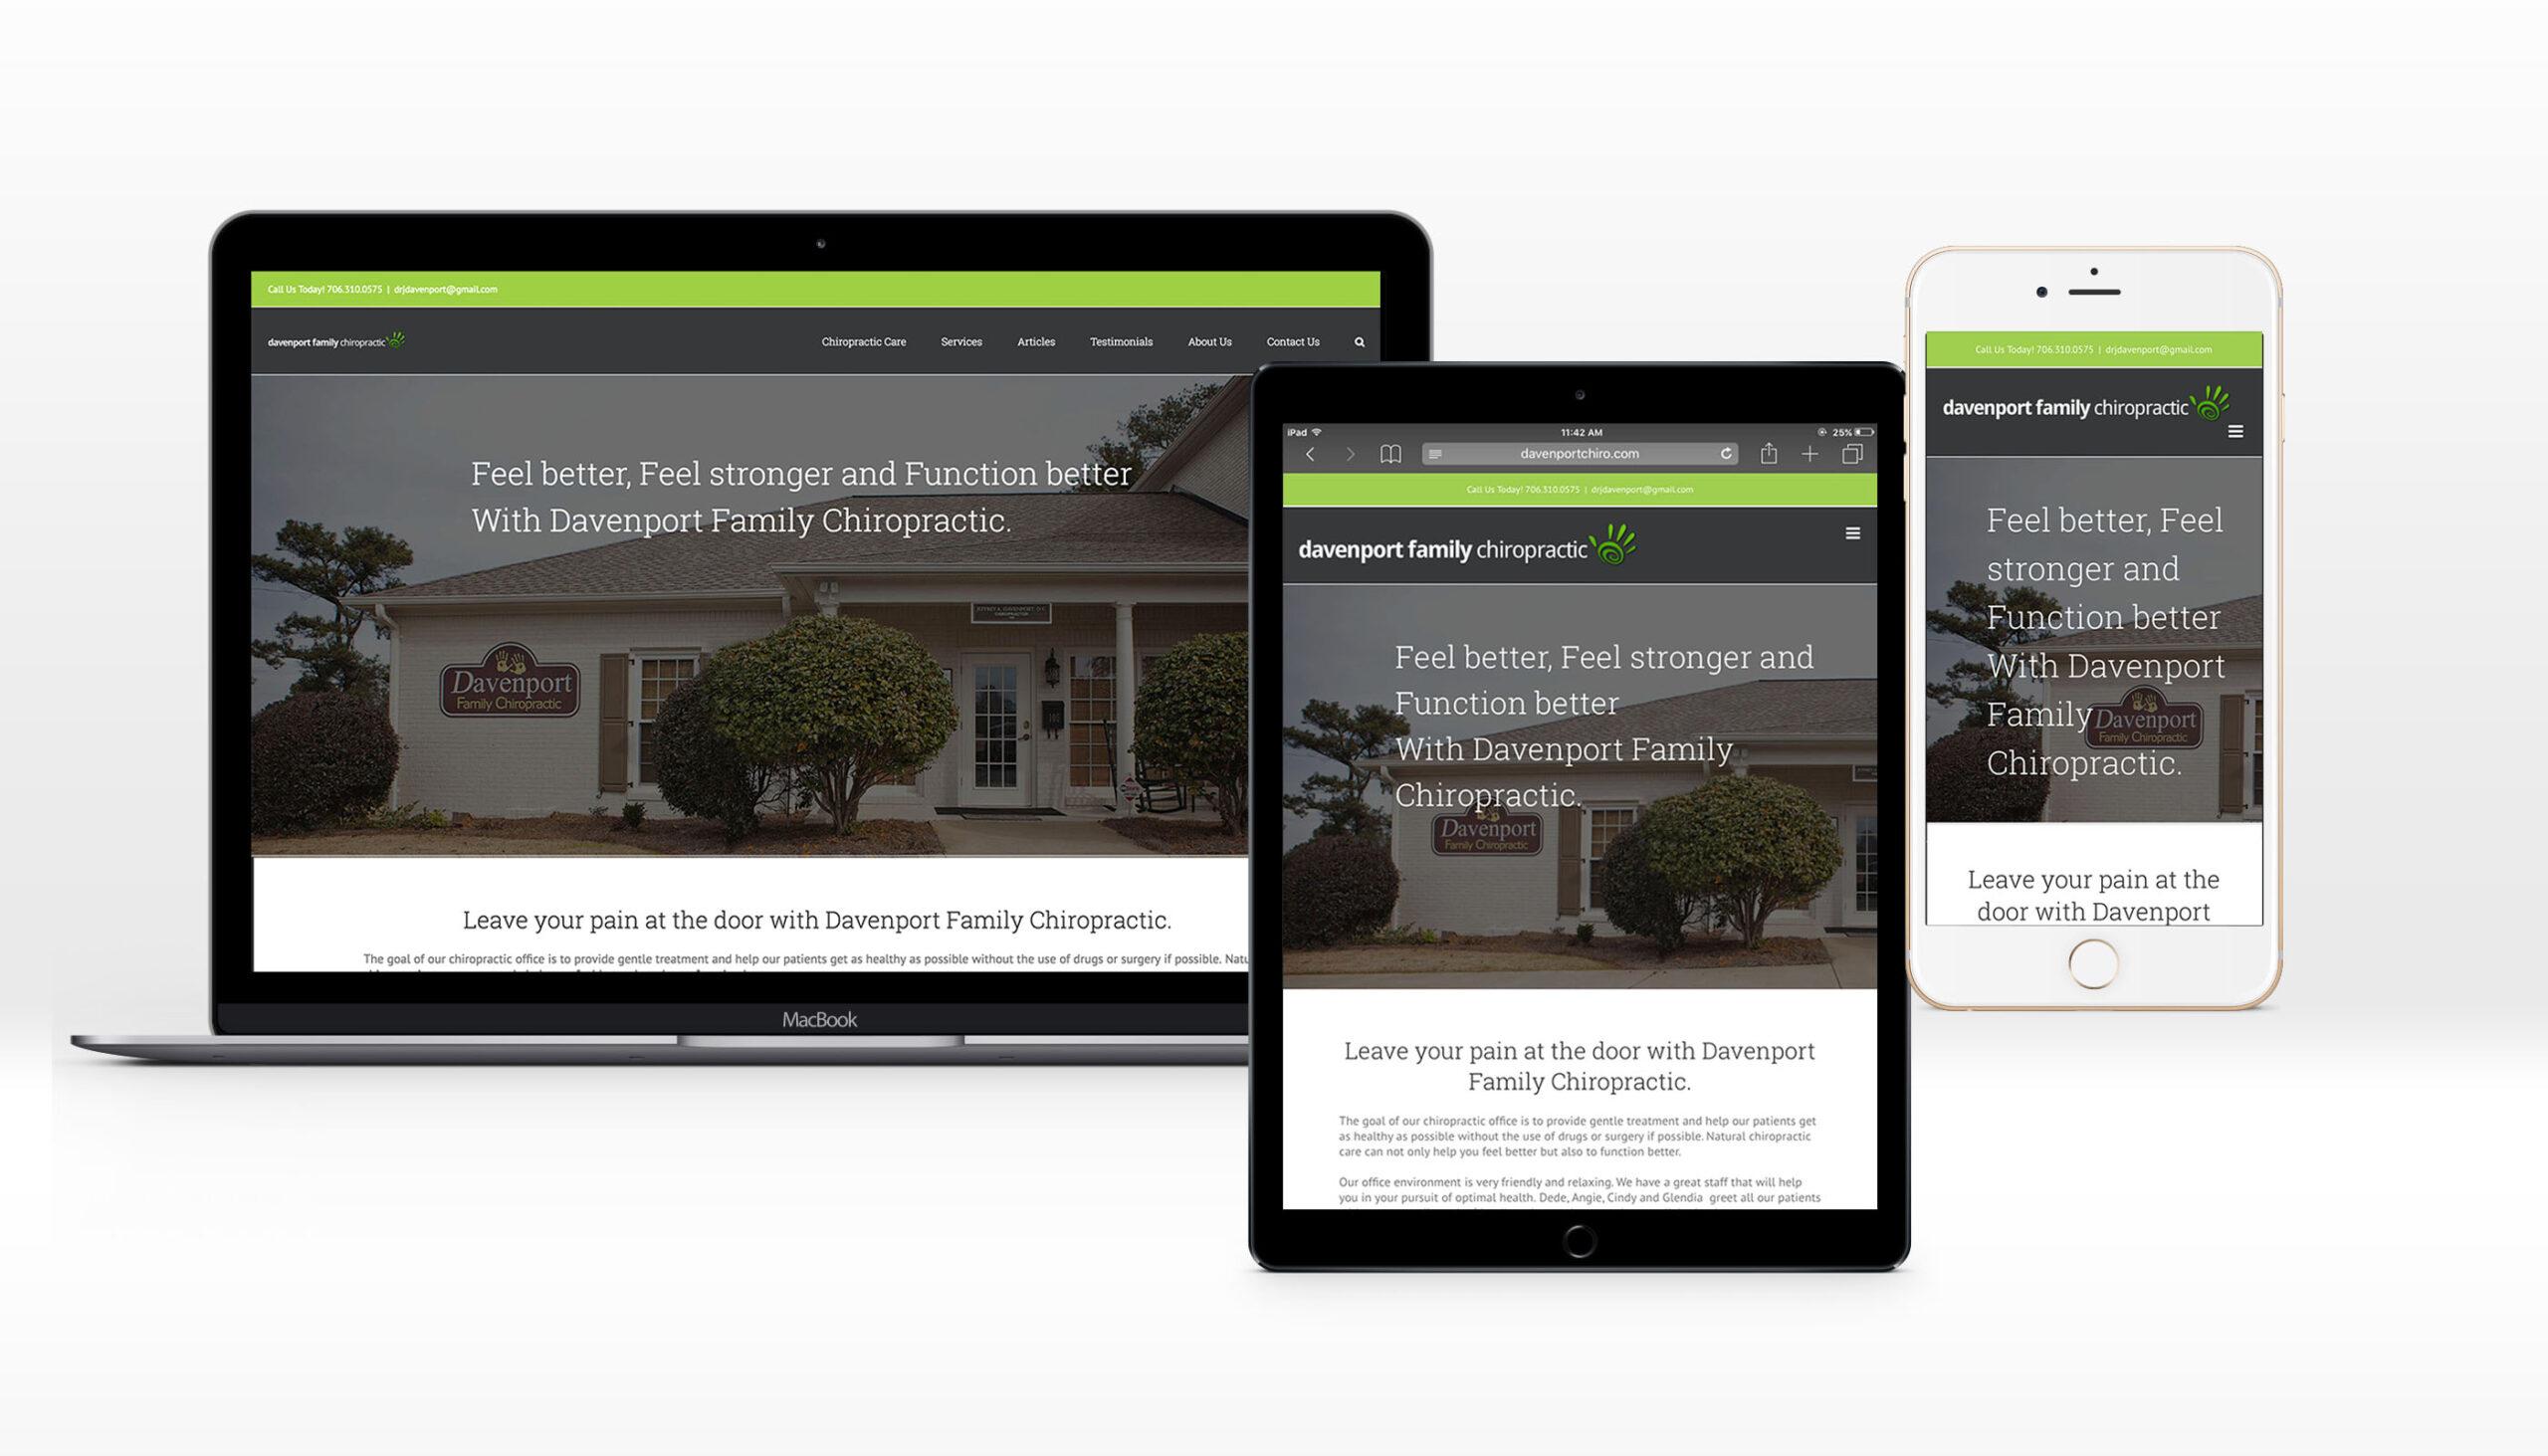 Modern Web Design For The Successful Website